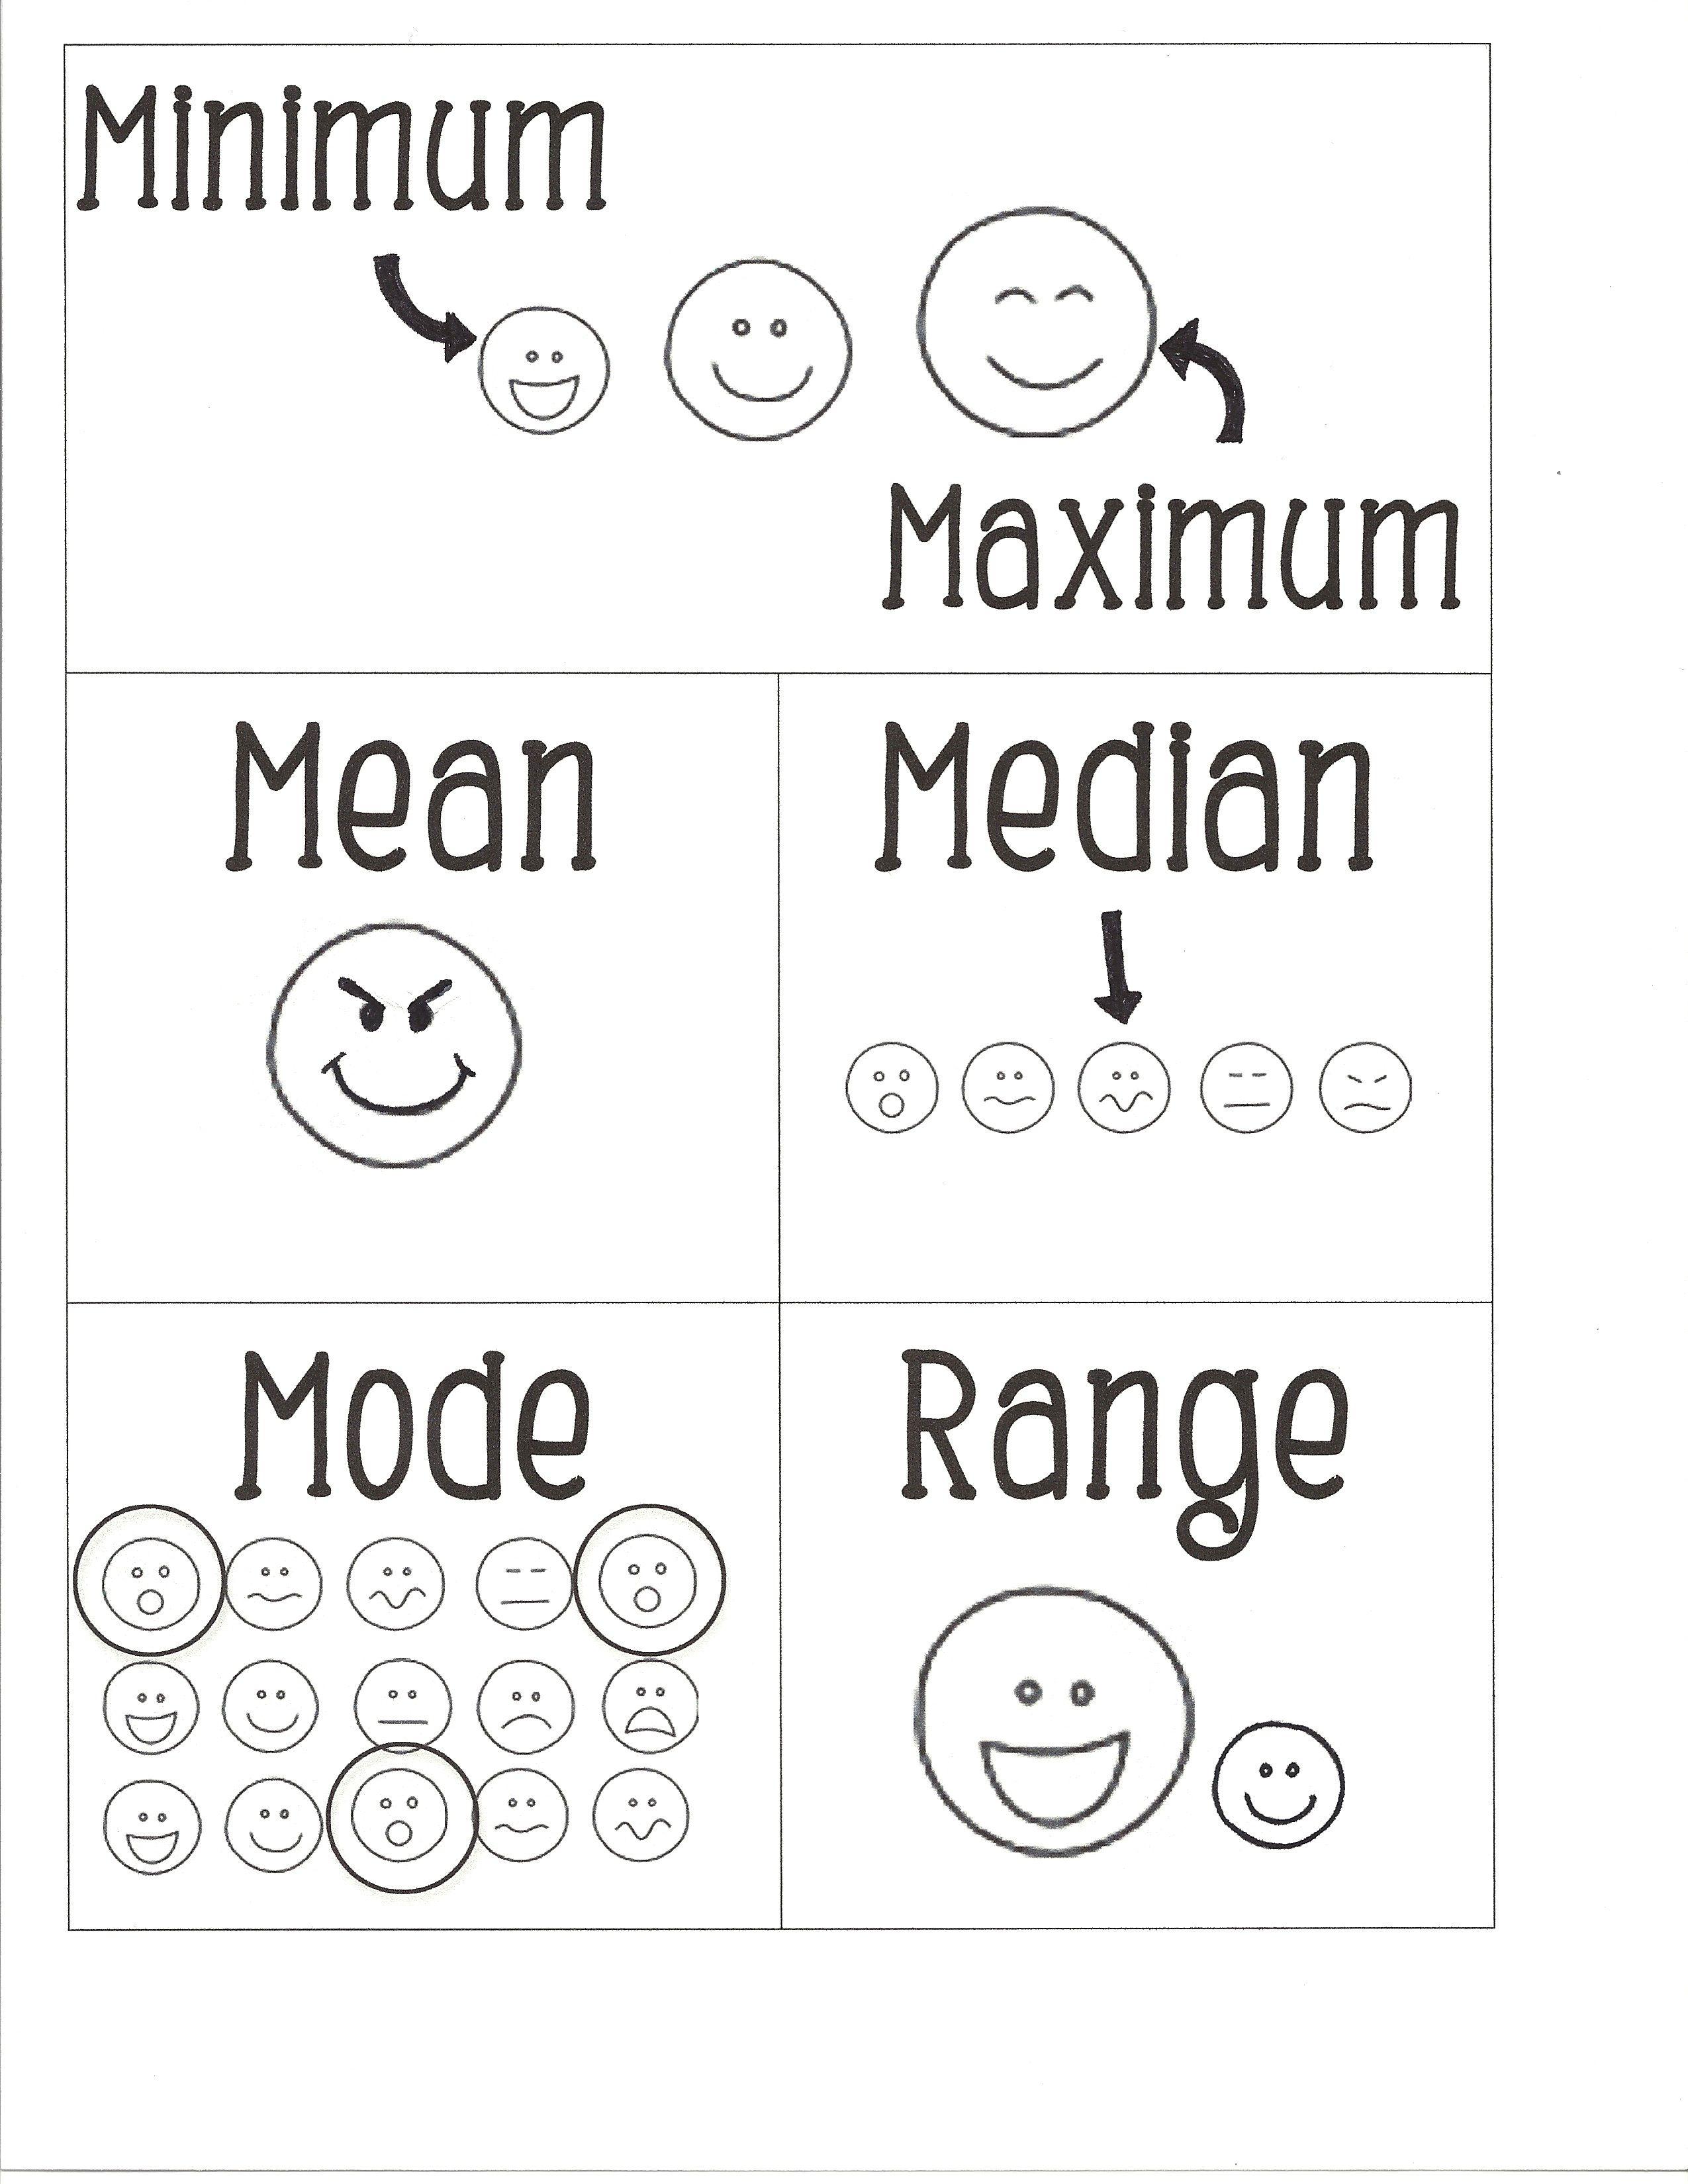 hight resolution of Pin by Megan Escobar (Olsen) on Math 7   Free math worksheets